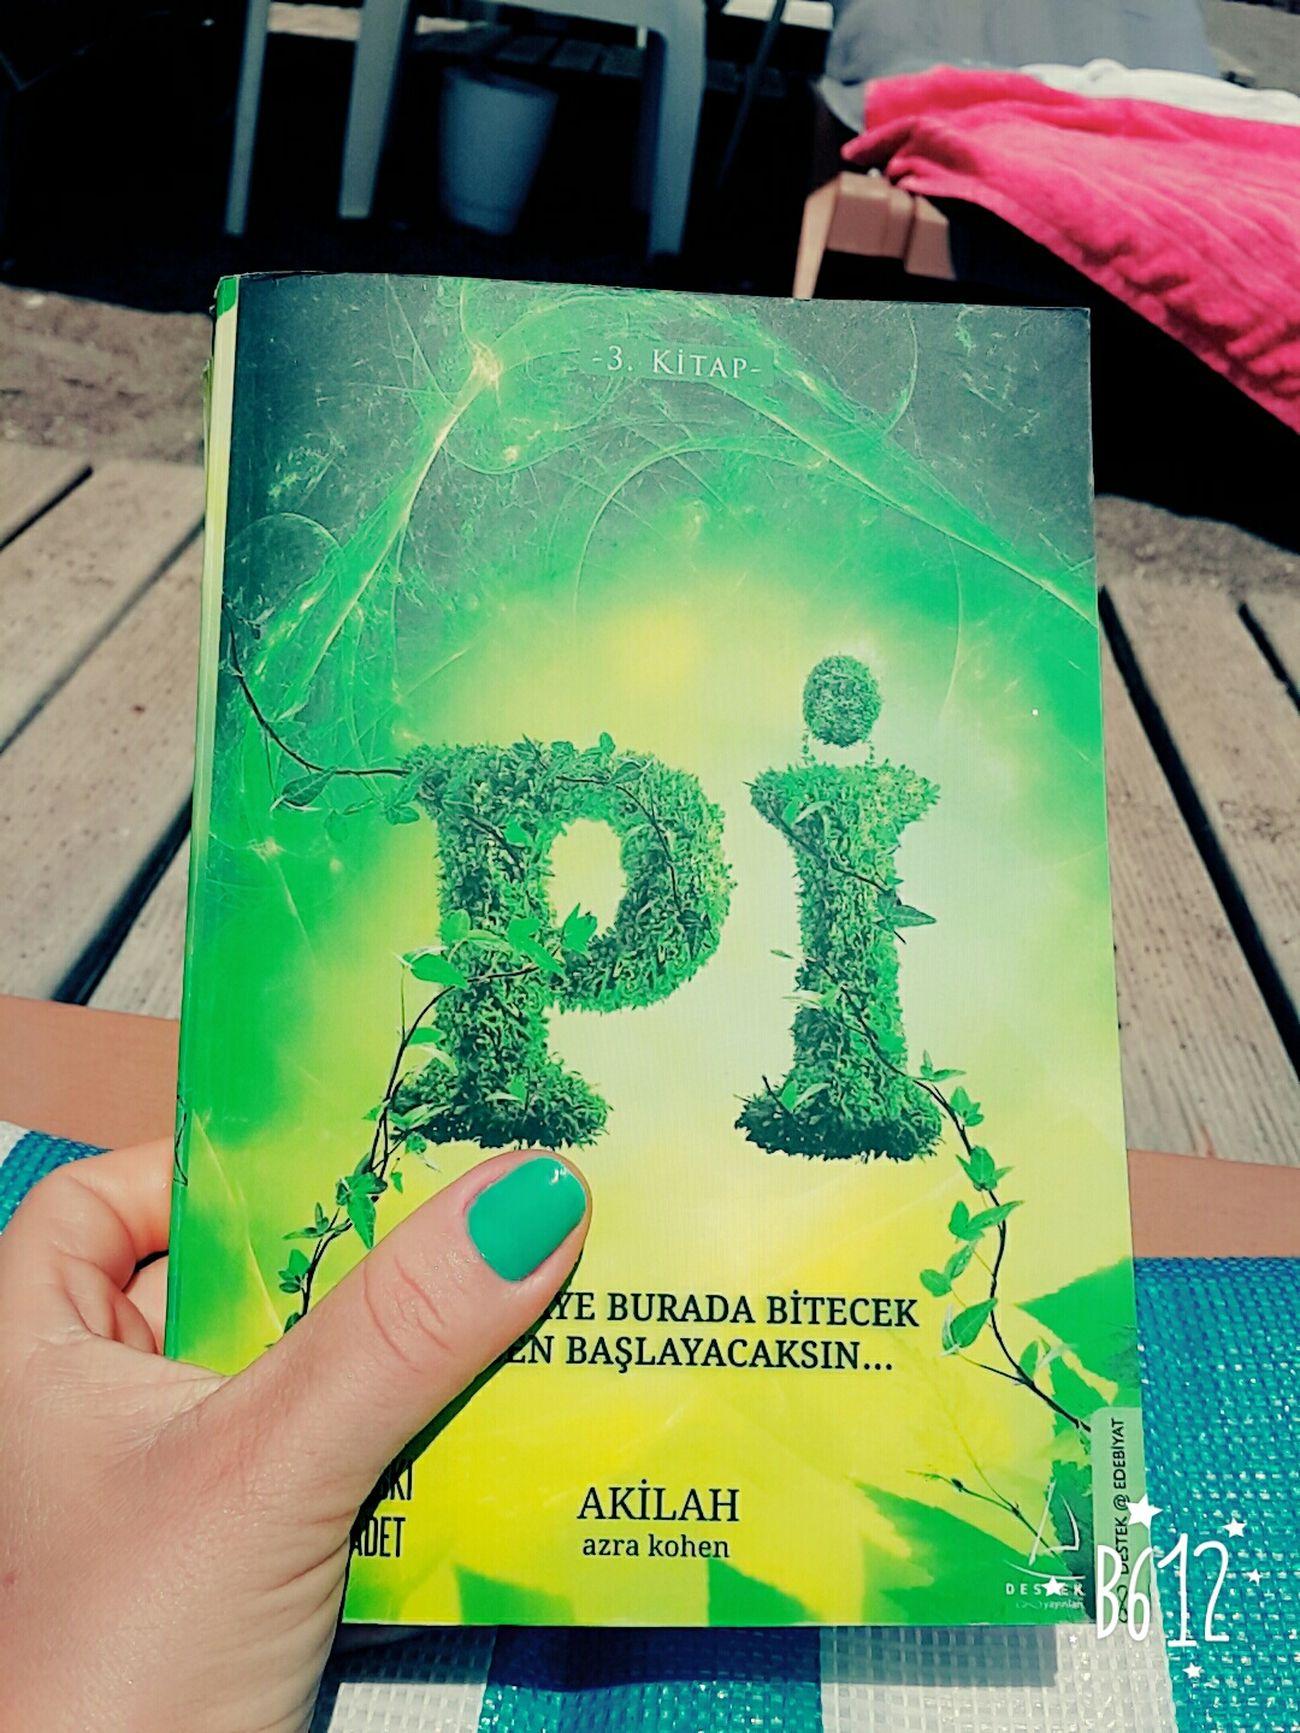 😄😉😅 Azrakohen Akilah Akilahfiçipi Kitapkurdu Kitap Kitapaski Enjoying The Sun Sunshine Antalya Todays Hot Look